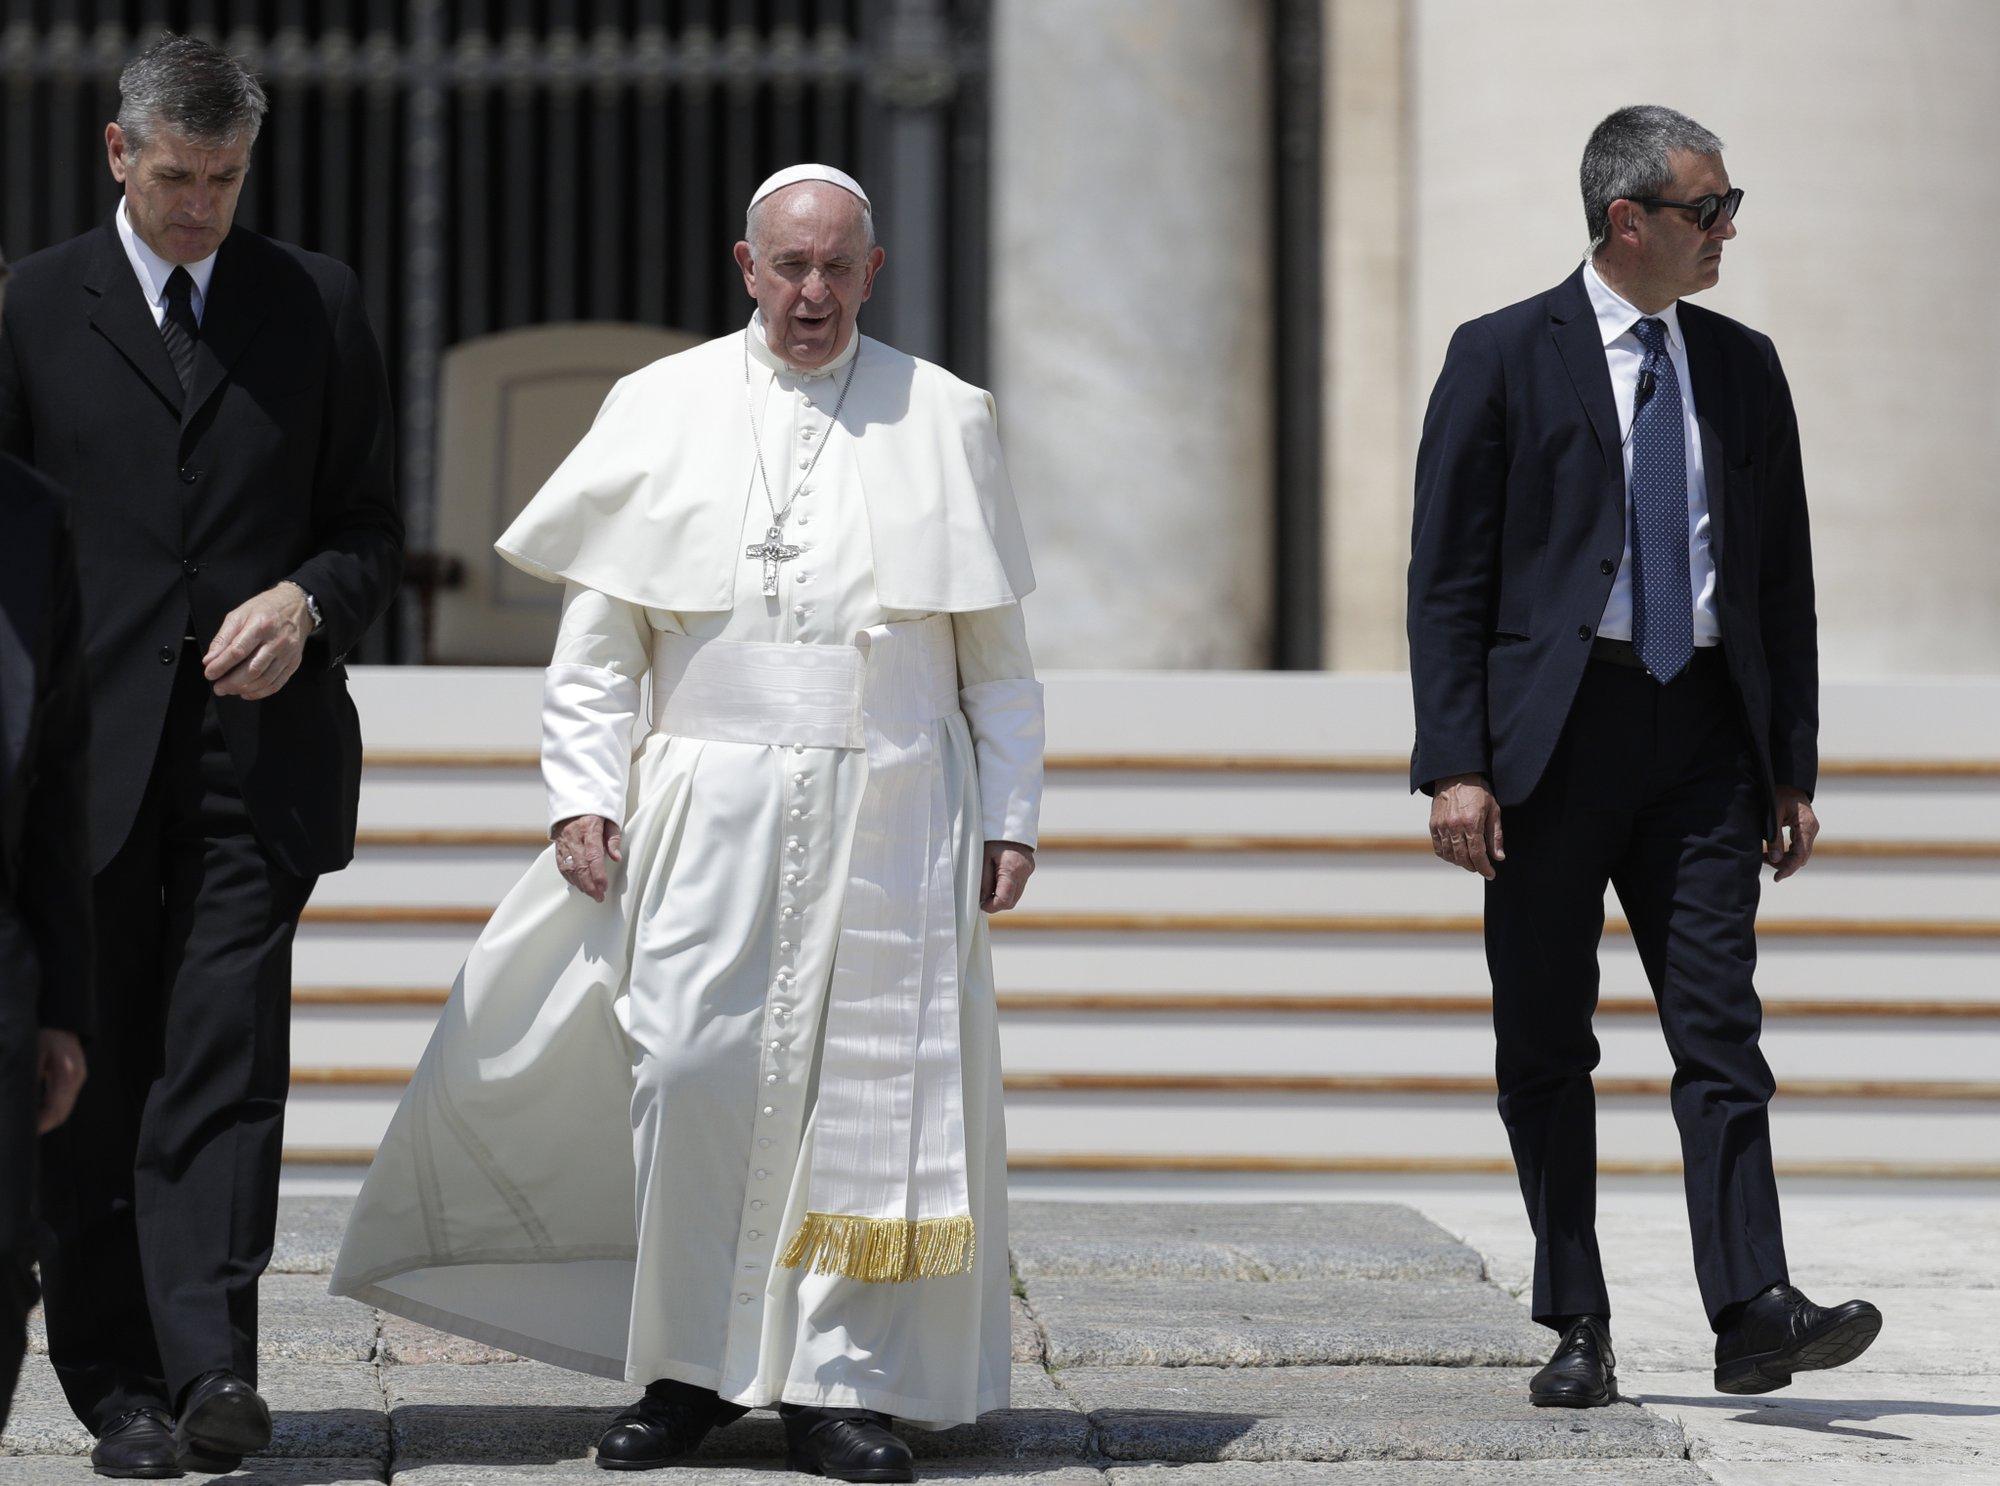 Pope to meet Putin before Vatican Ukraine meeting